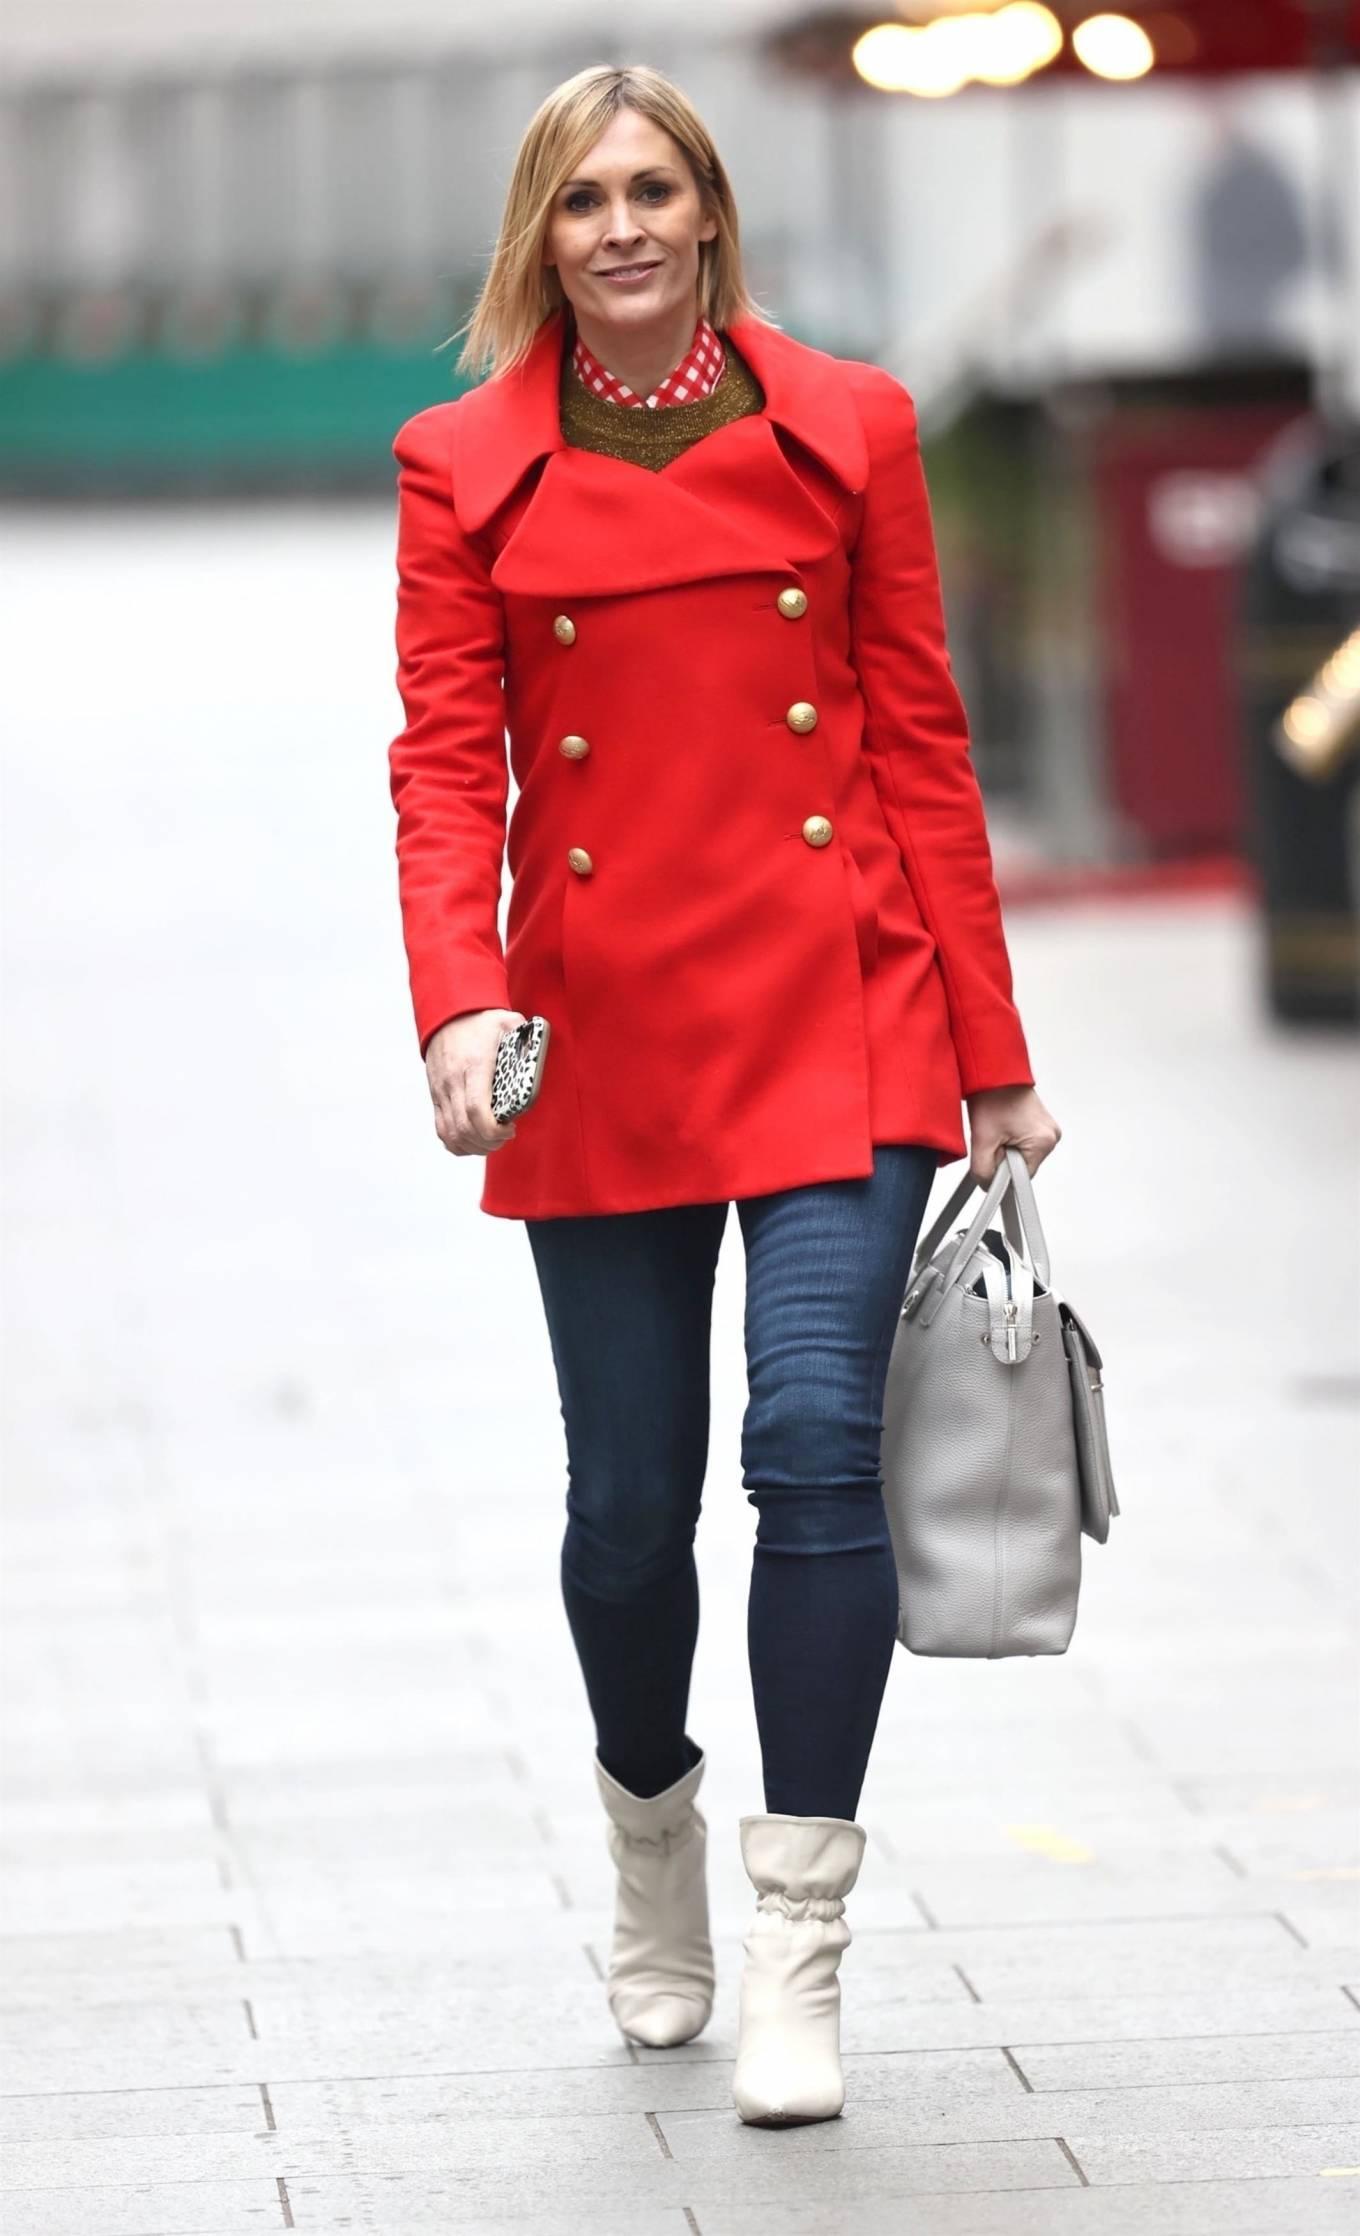 Jenni Falconer - Wears striking read coat at the Heart Radio Studios in London